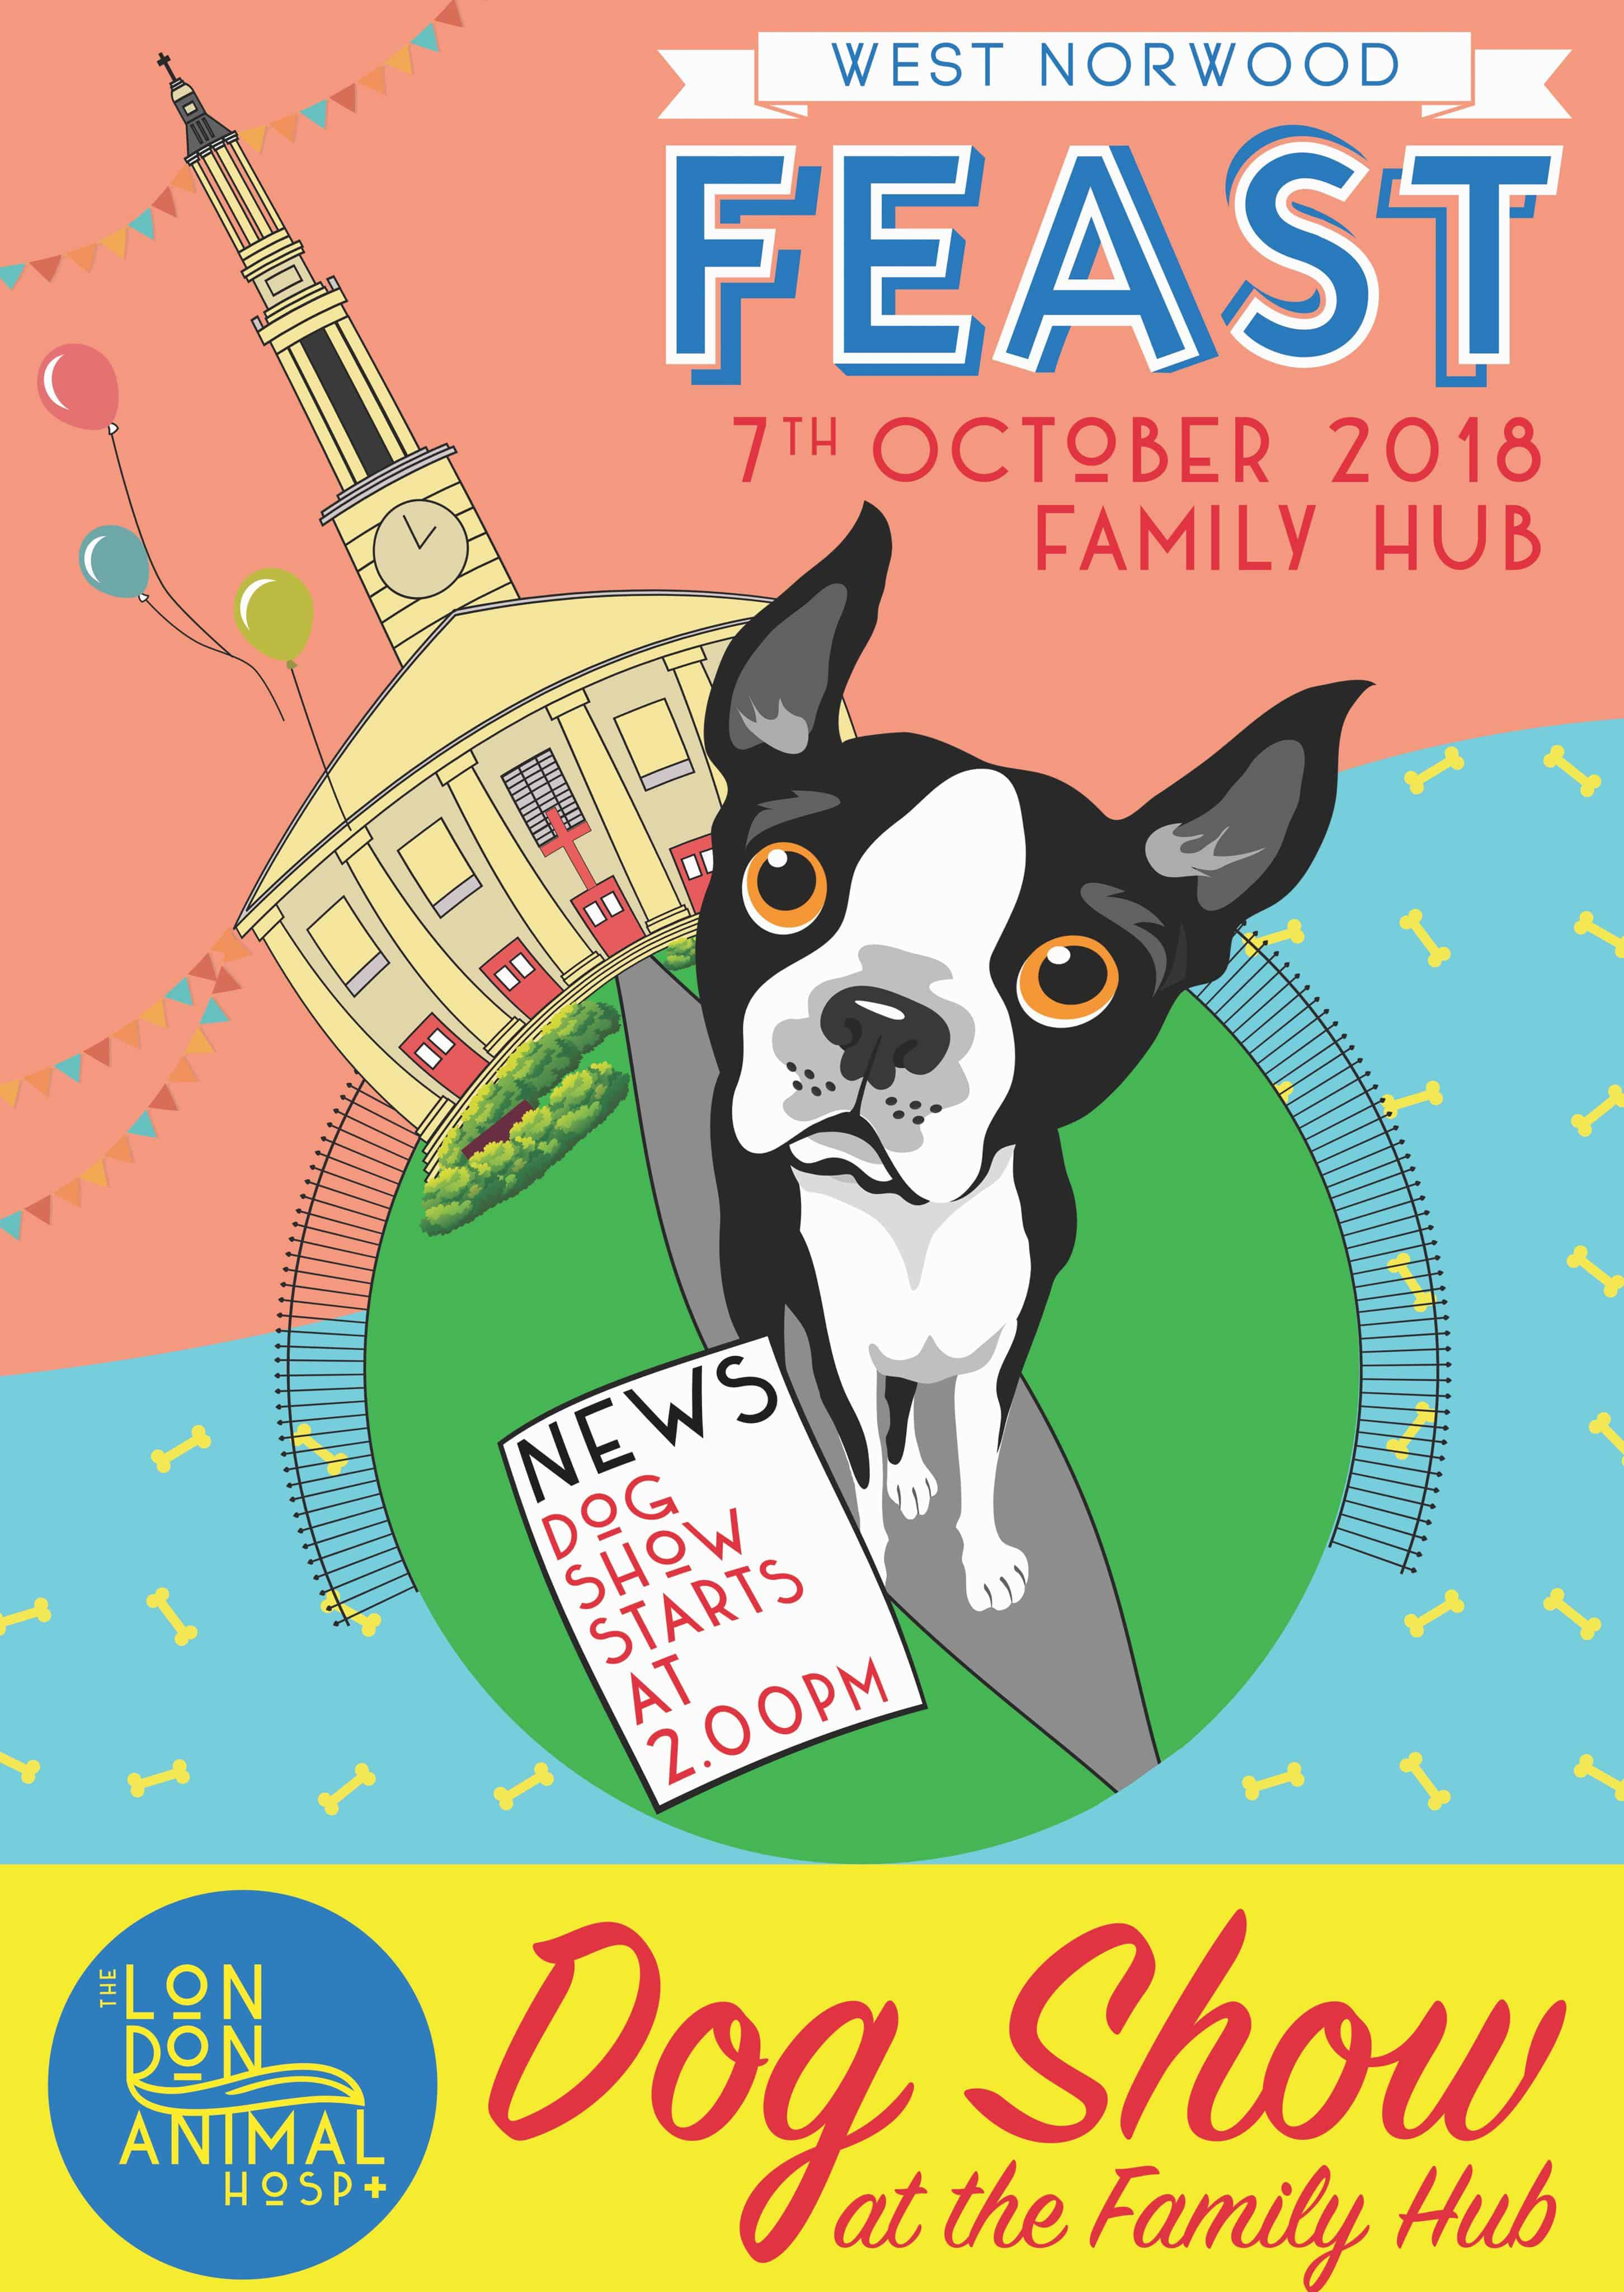 West Norwood Feast Dog Show